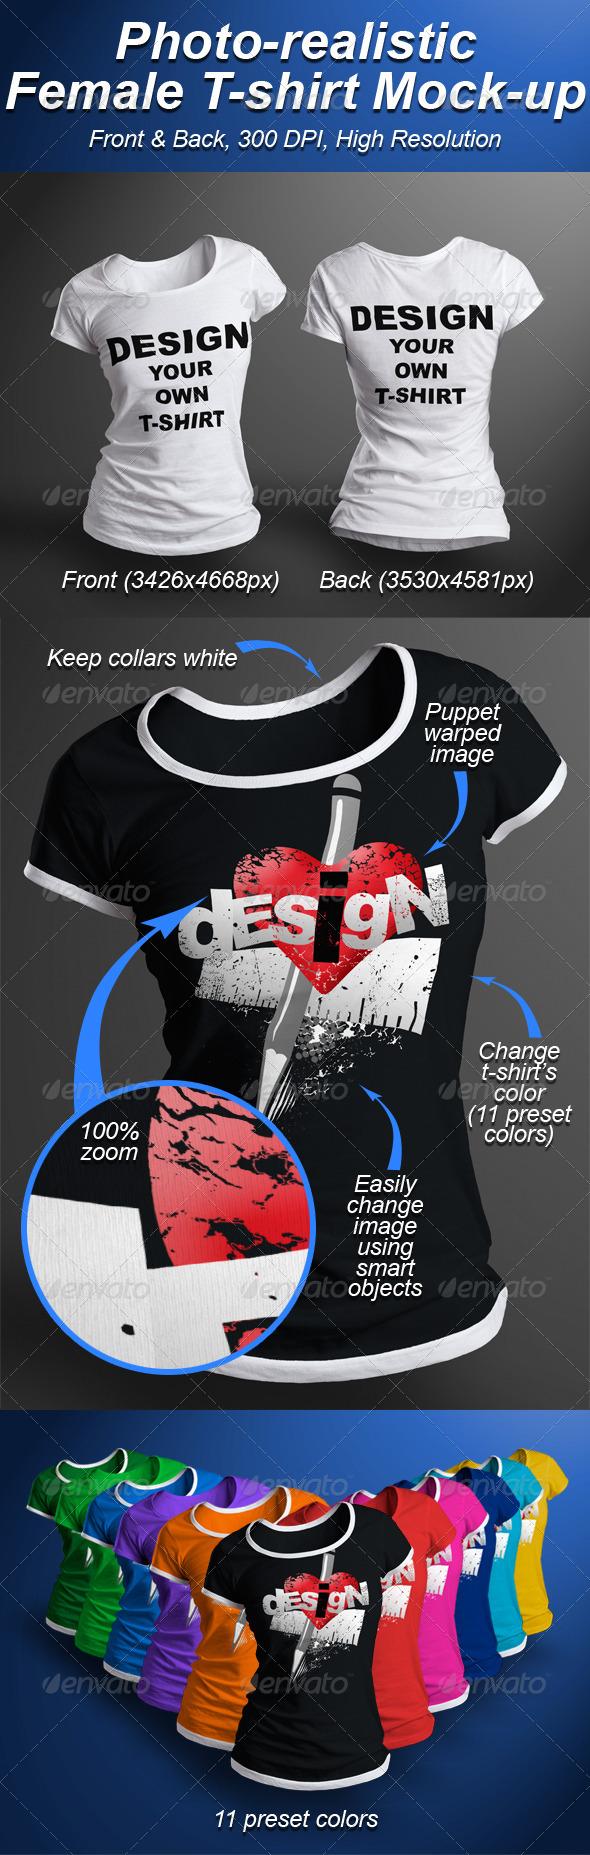 Female T-shirt Mock-up Photorealistic 3D Look